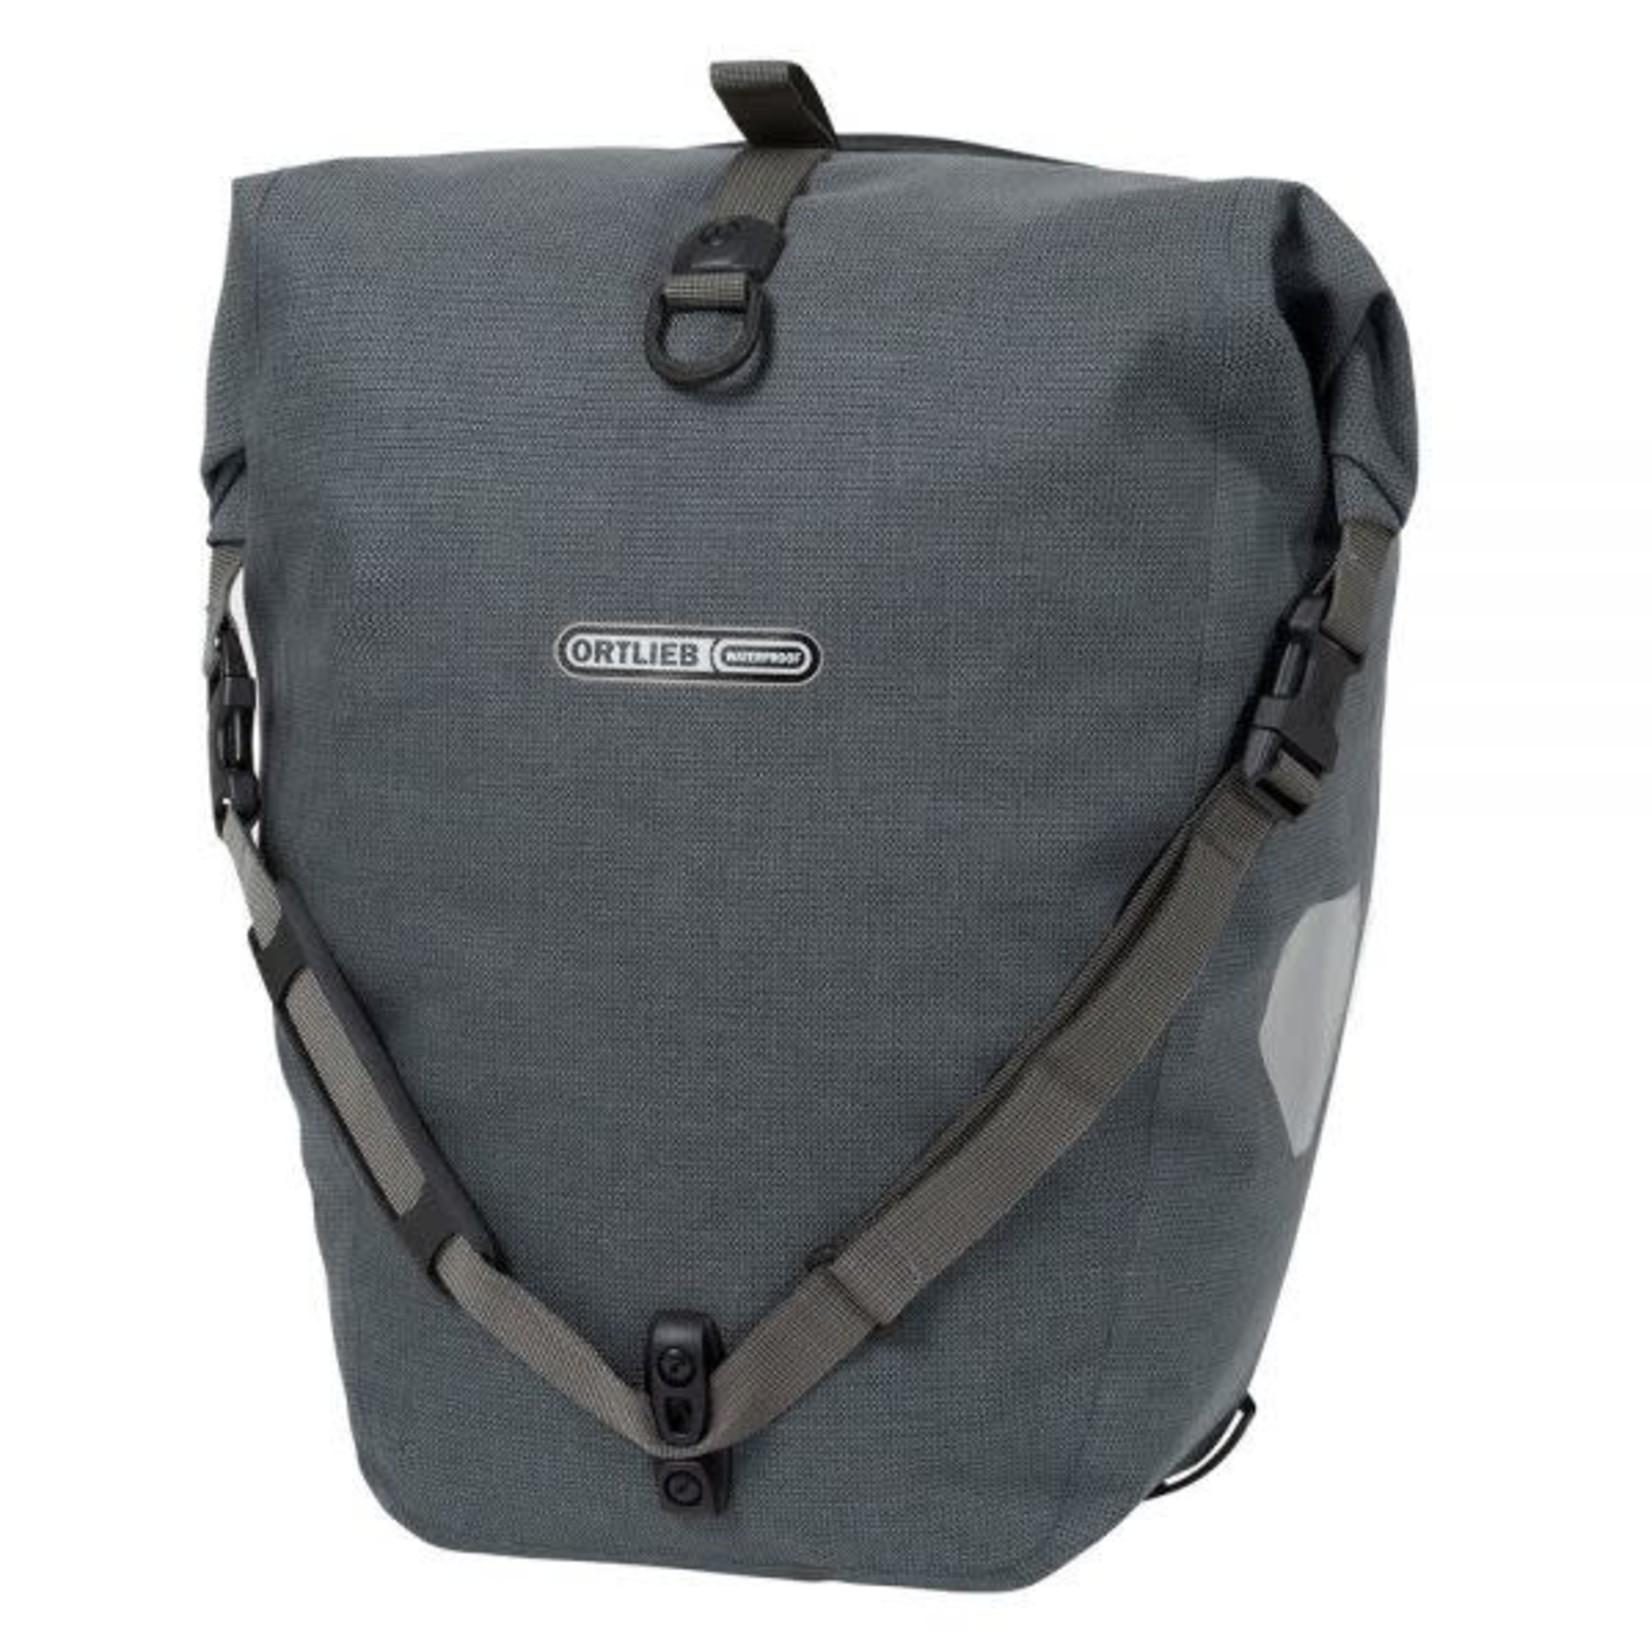 ORTLIEB ORTLIEB Tasche Back-Roller Design (Single Bag)